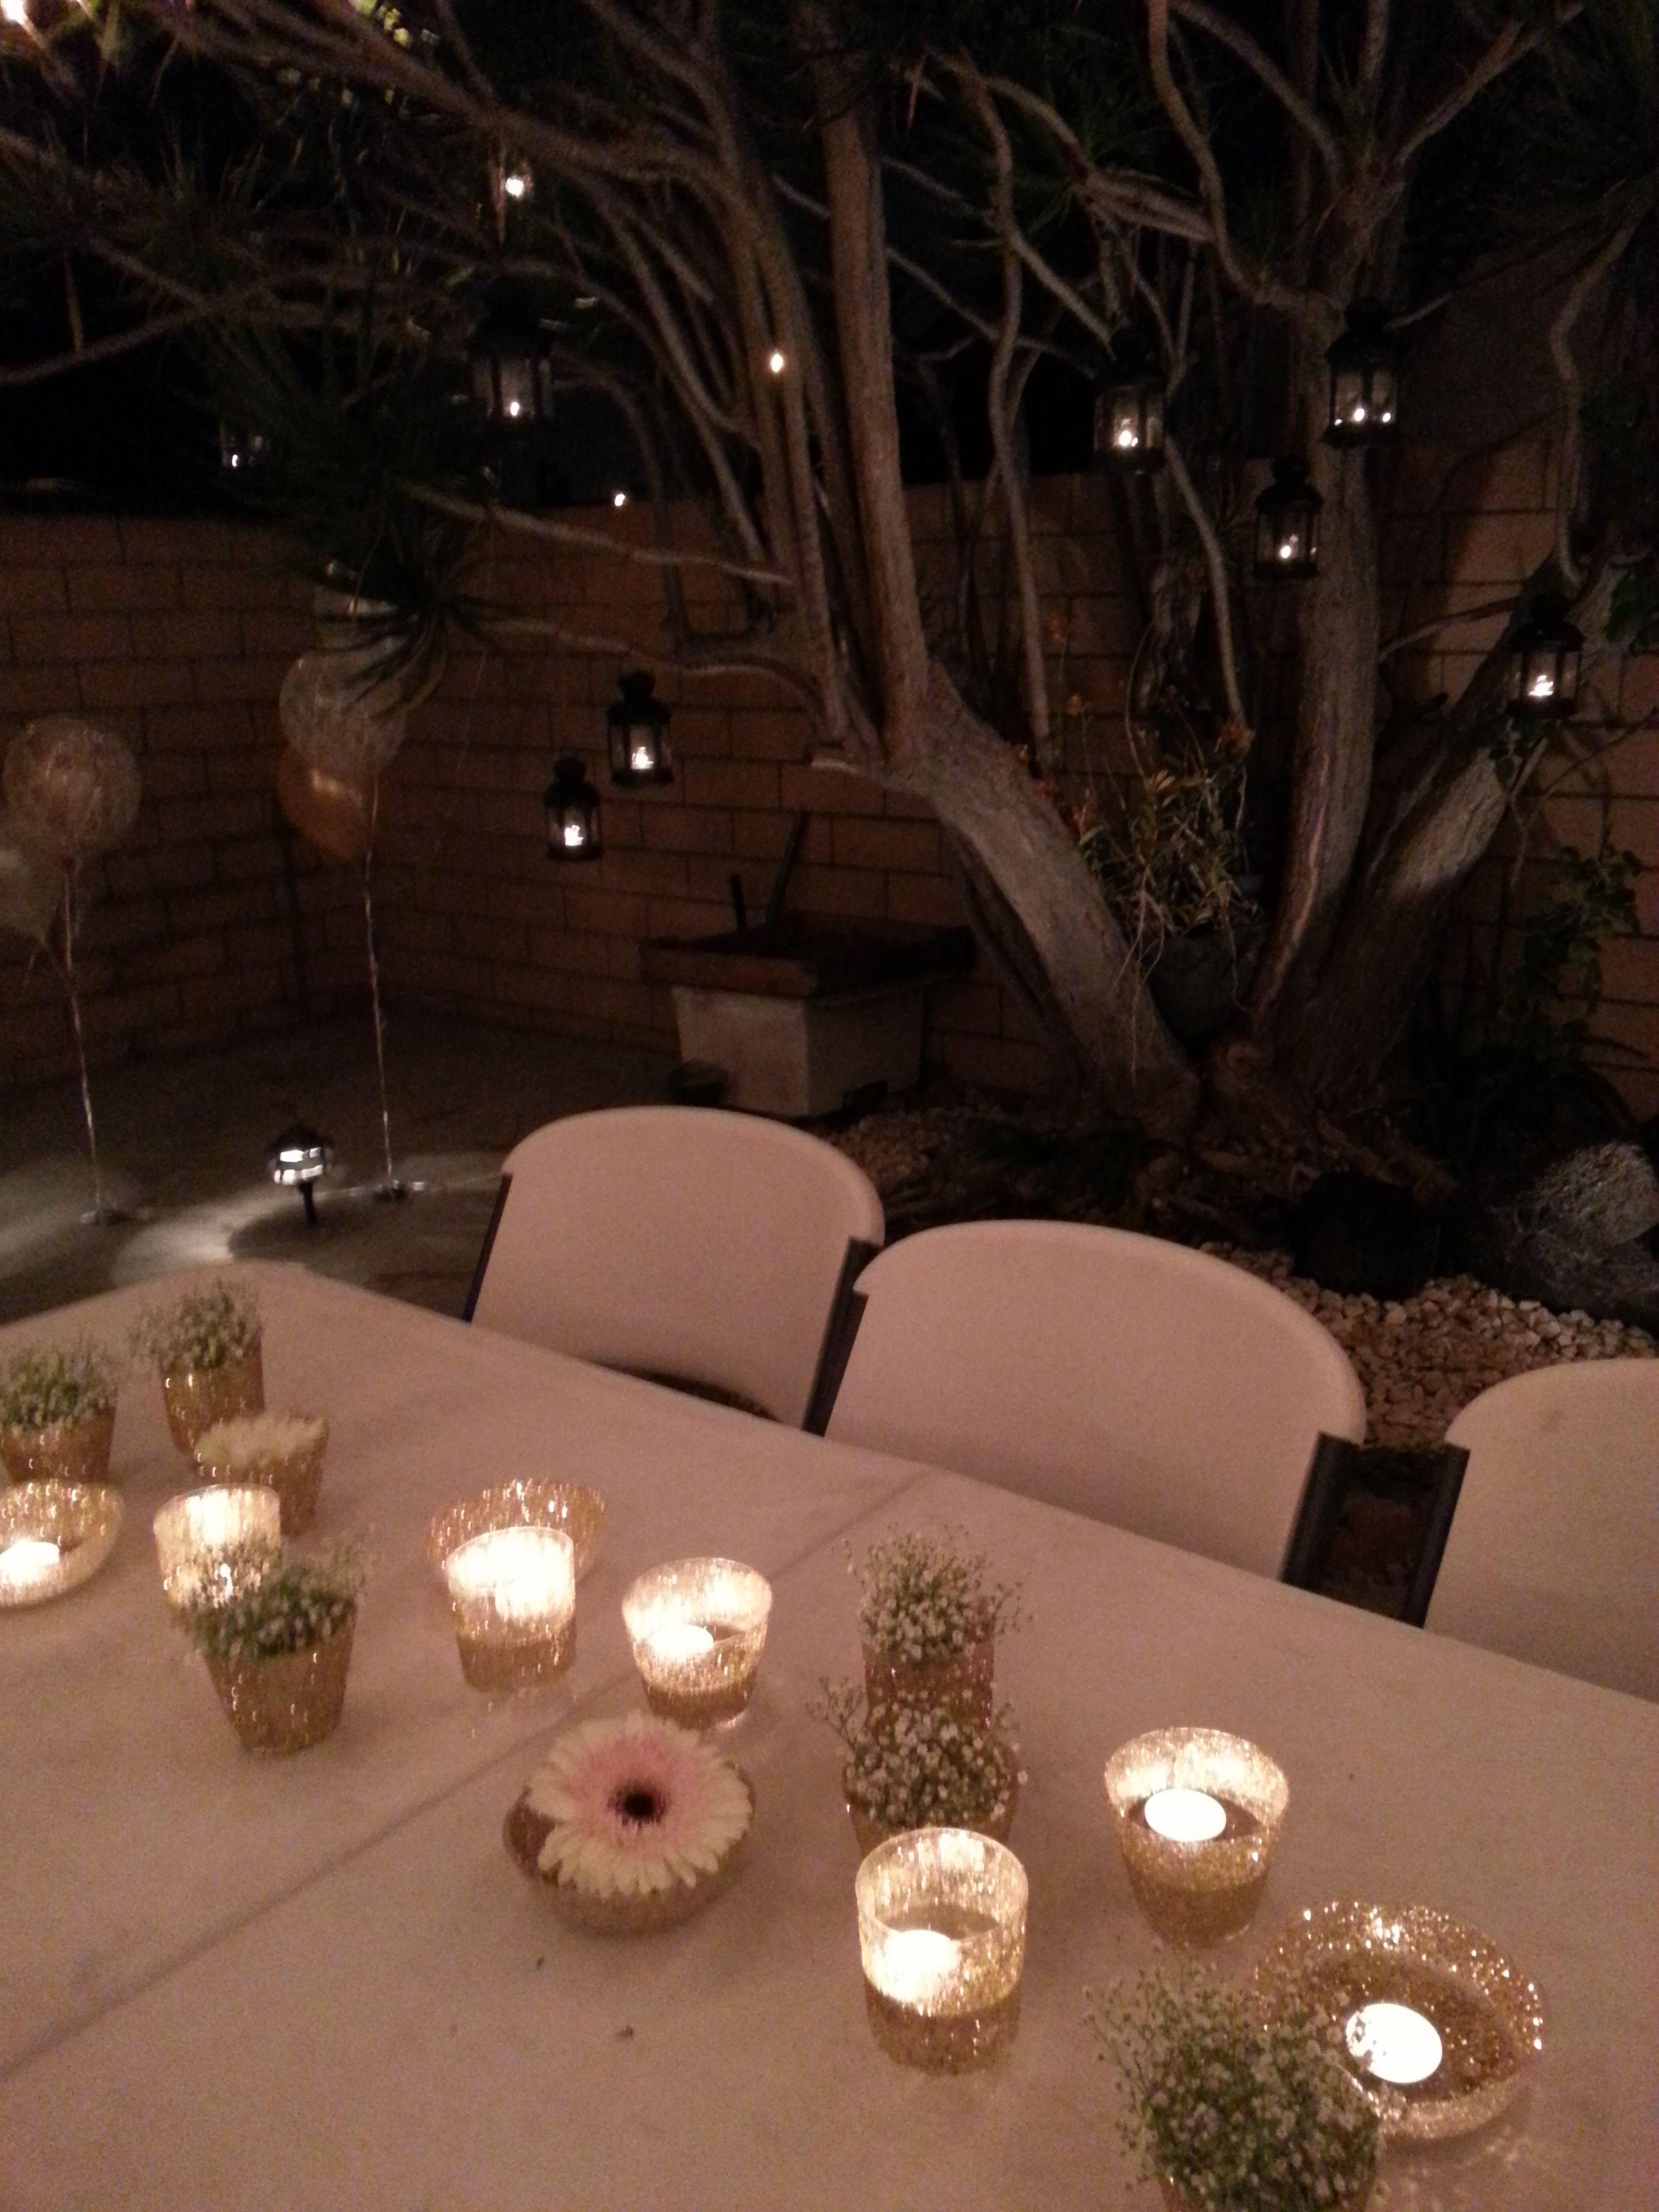 Backyard Party Decorations  Lanterns, Centerpieces  Dollar Tree Plastic